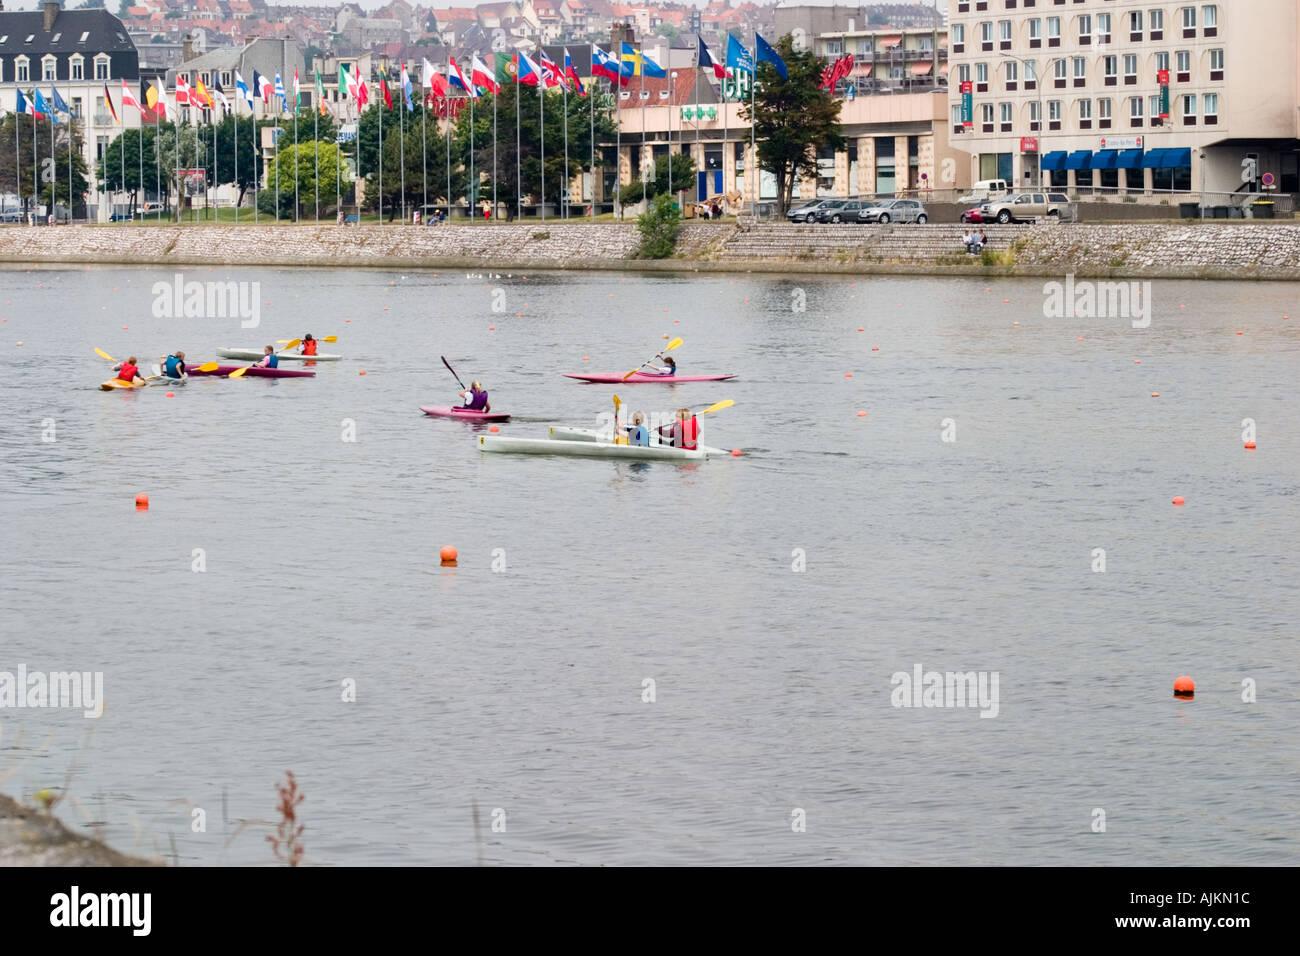 Schoolchildren take a canoeing lesson on the River in Boulogne Pas de Calais - Stock Image